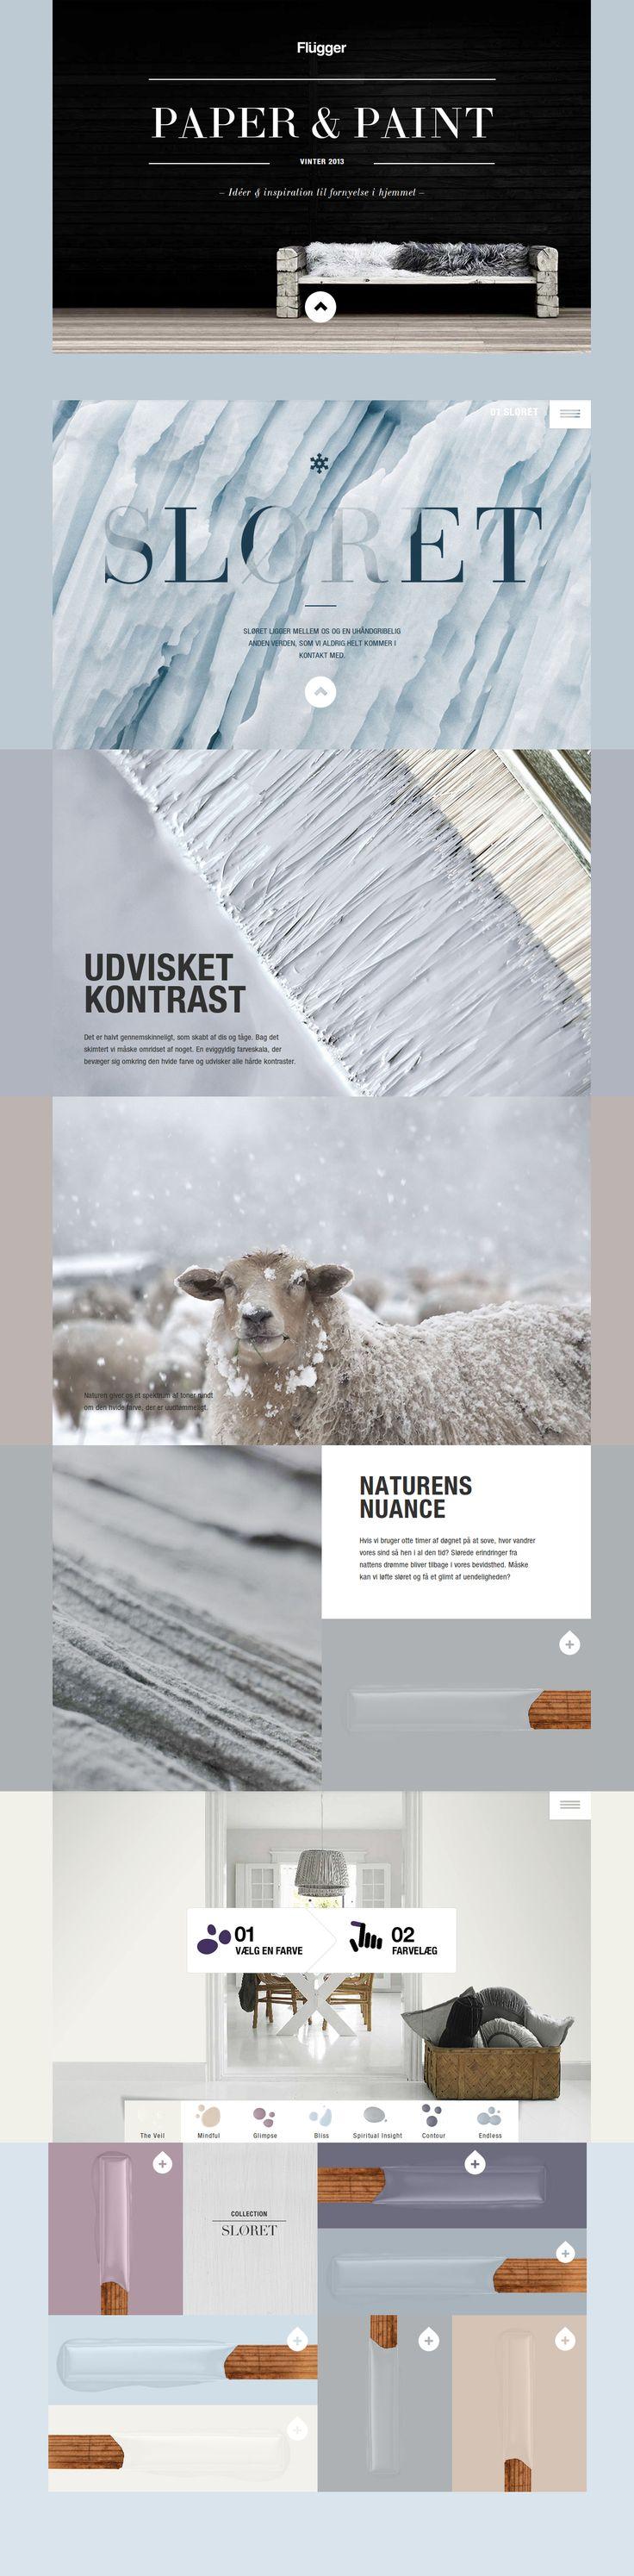 Paper & Paint Magazine http://www.awwwards.com/web-design-awards/paper-paint-magazine #webdesign #inspiration #UI #Design